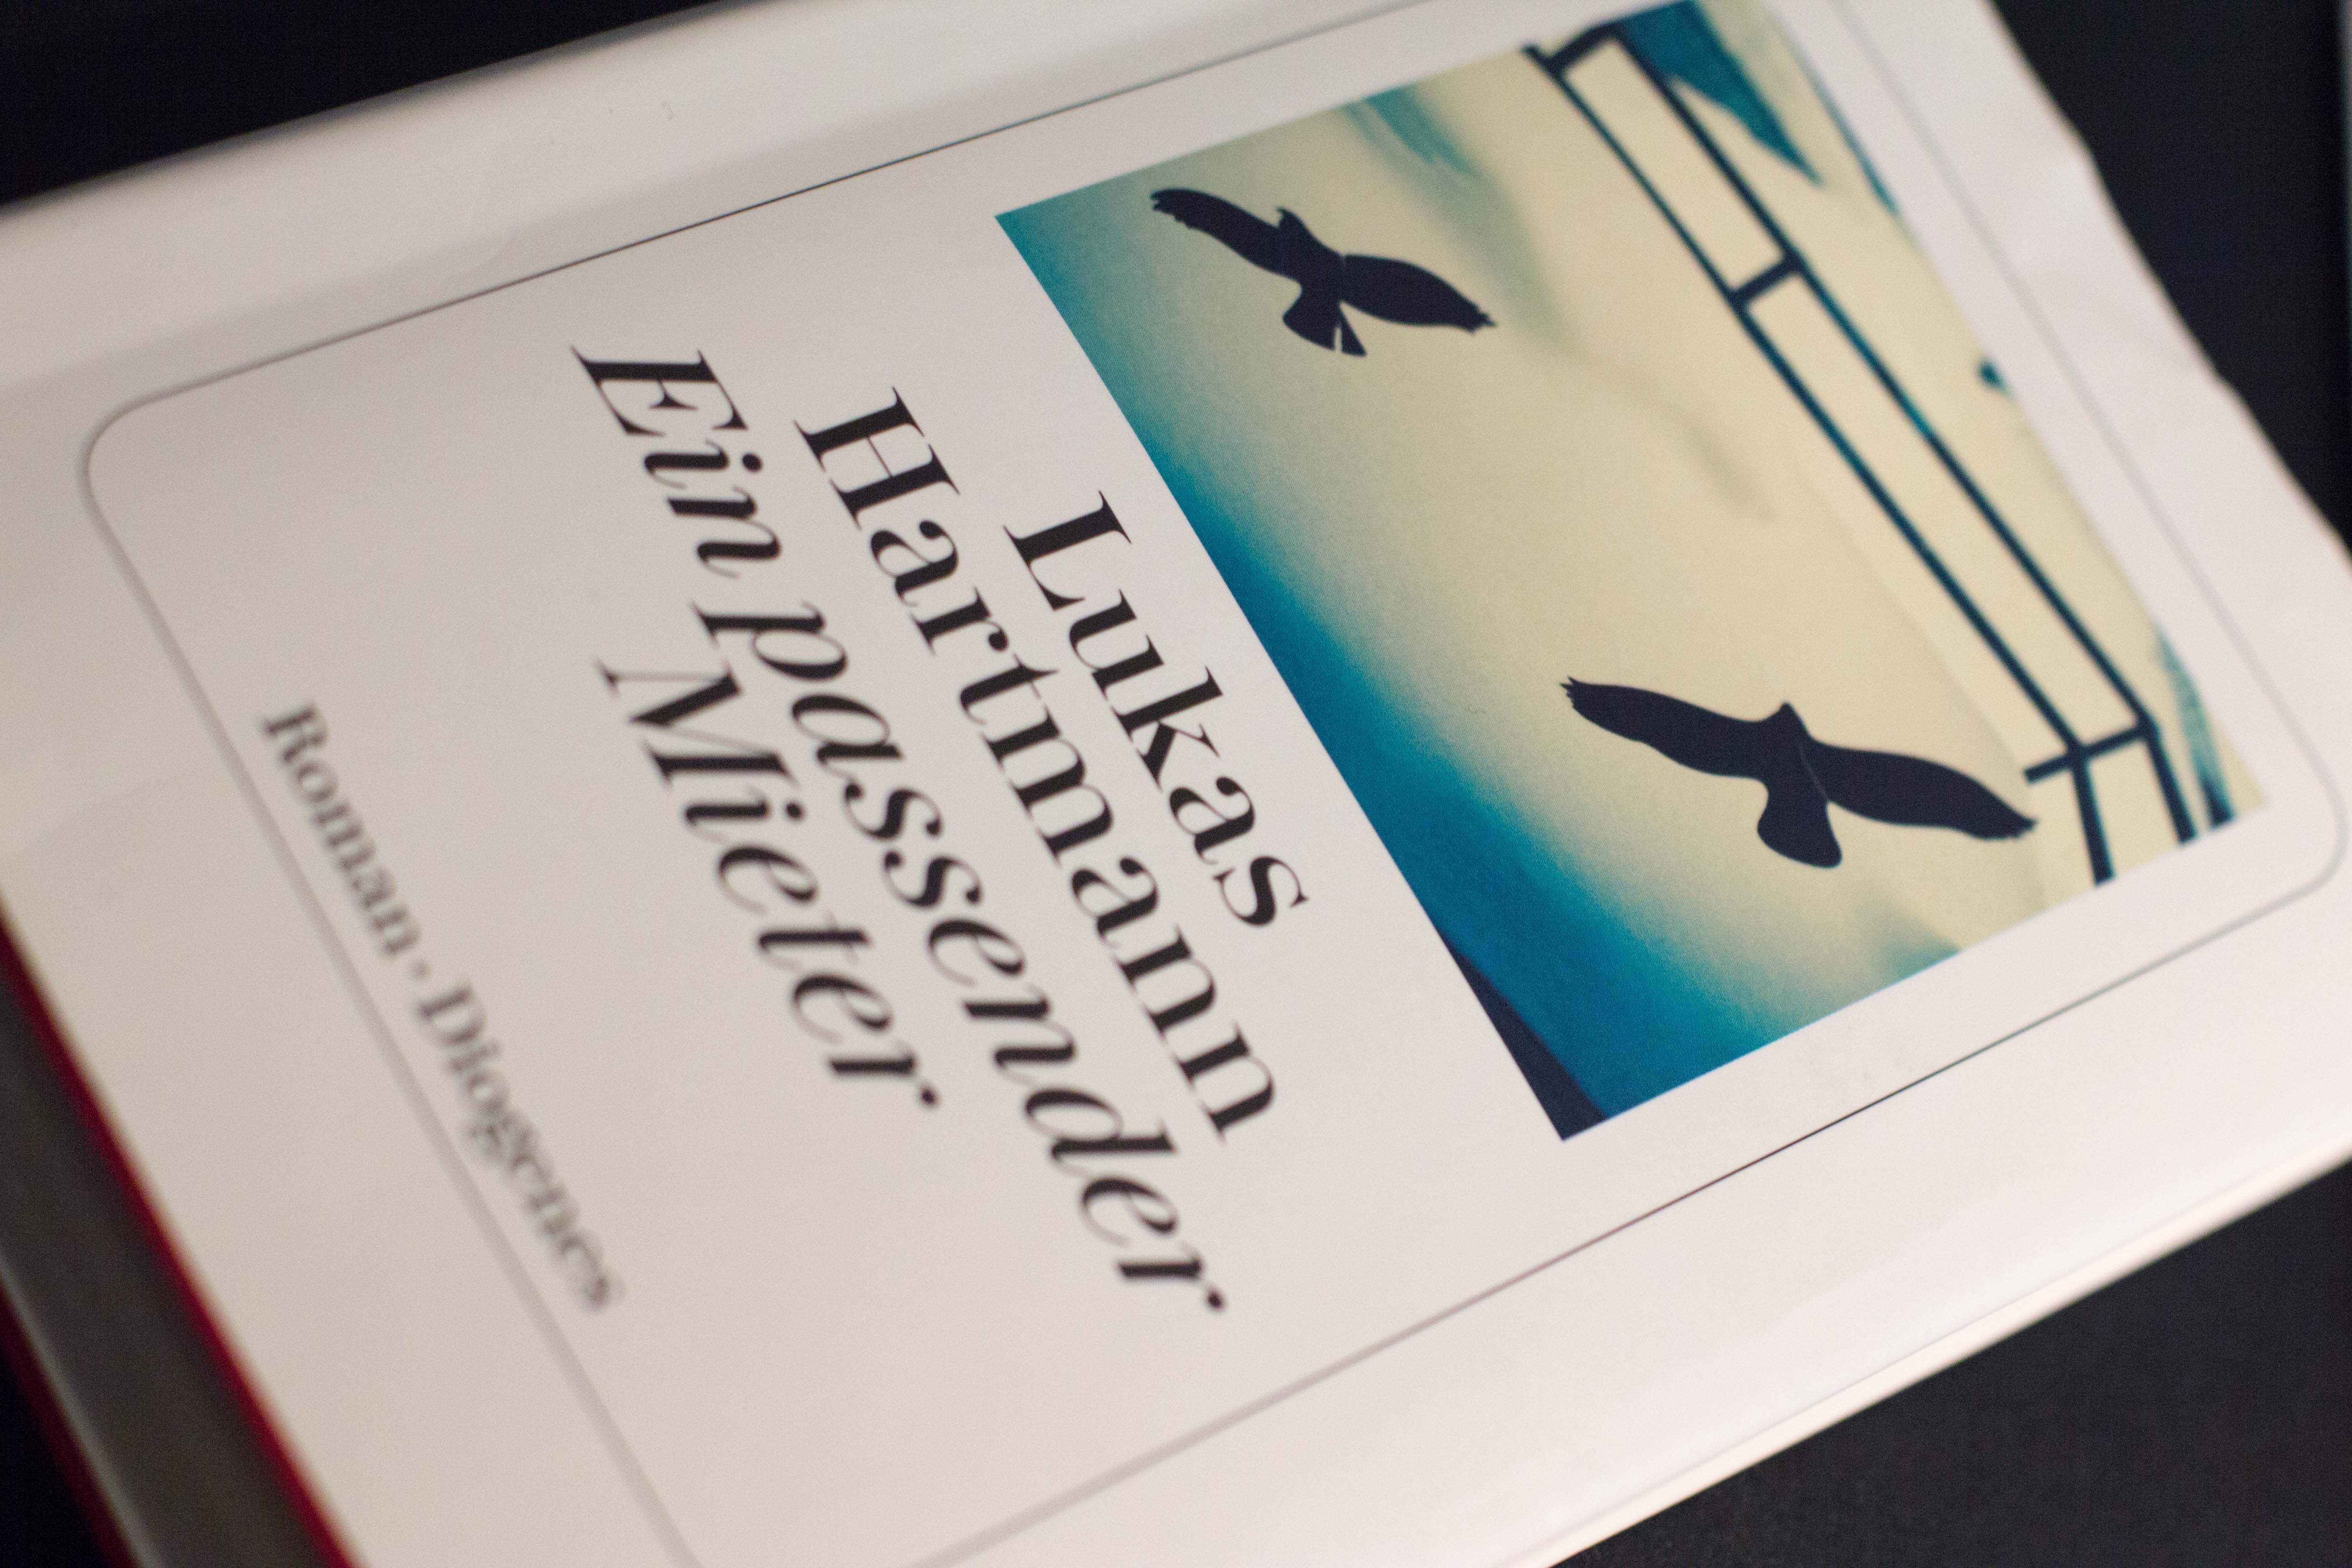 Romane Buchclub Beziehungsunfähig Lukas Hartmann